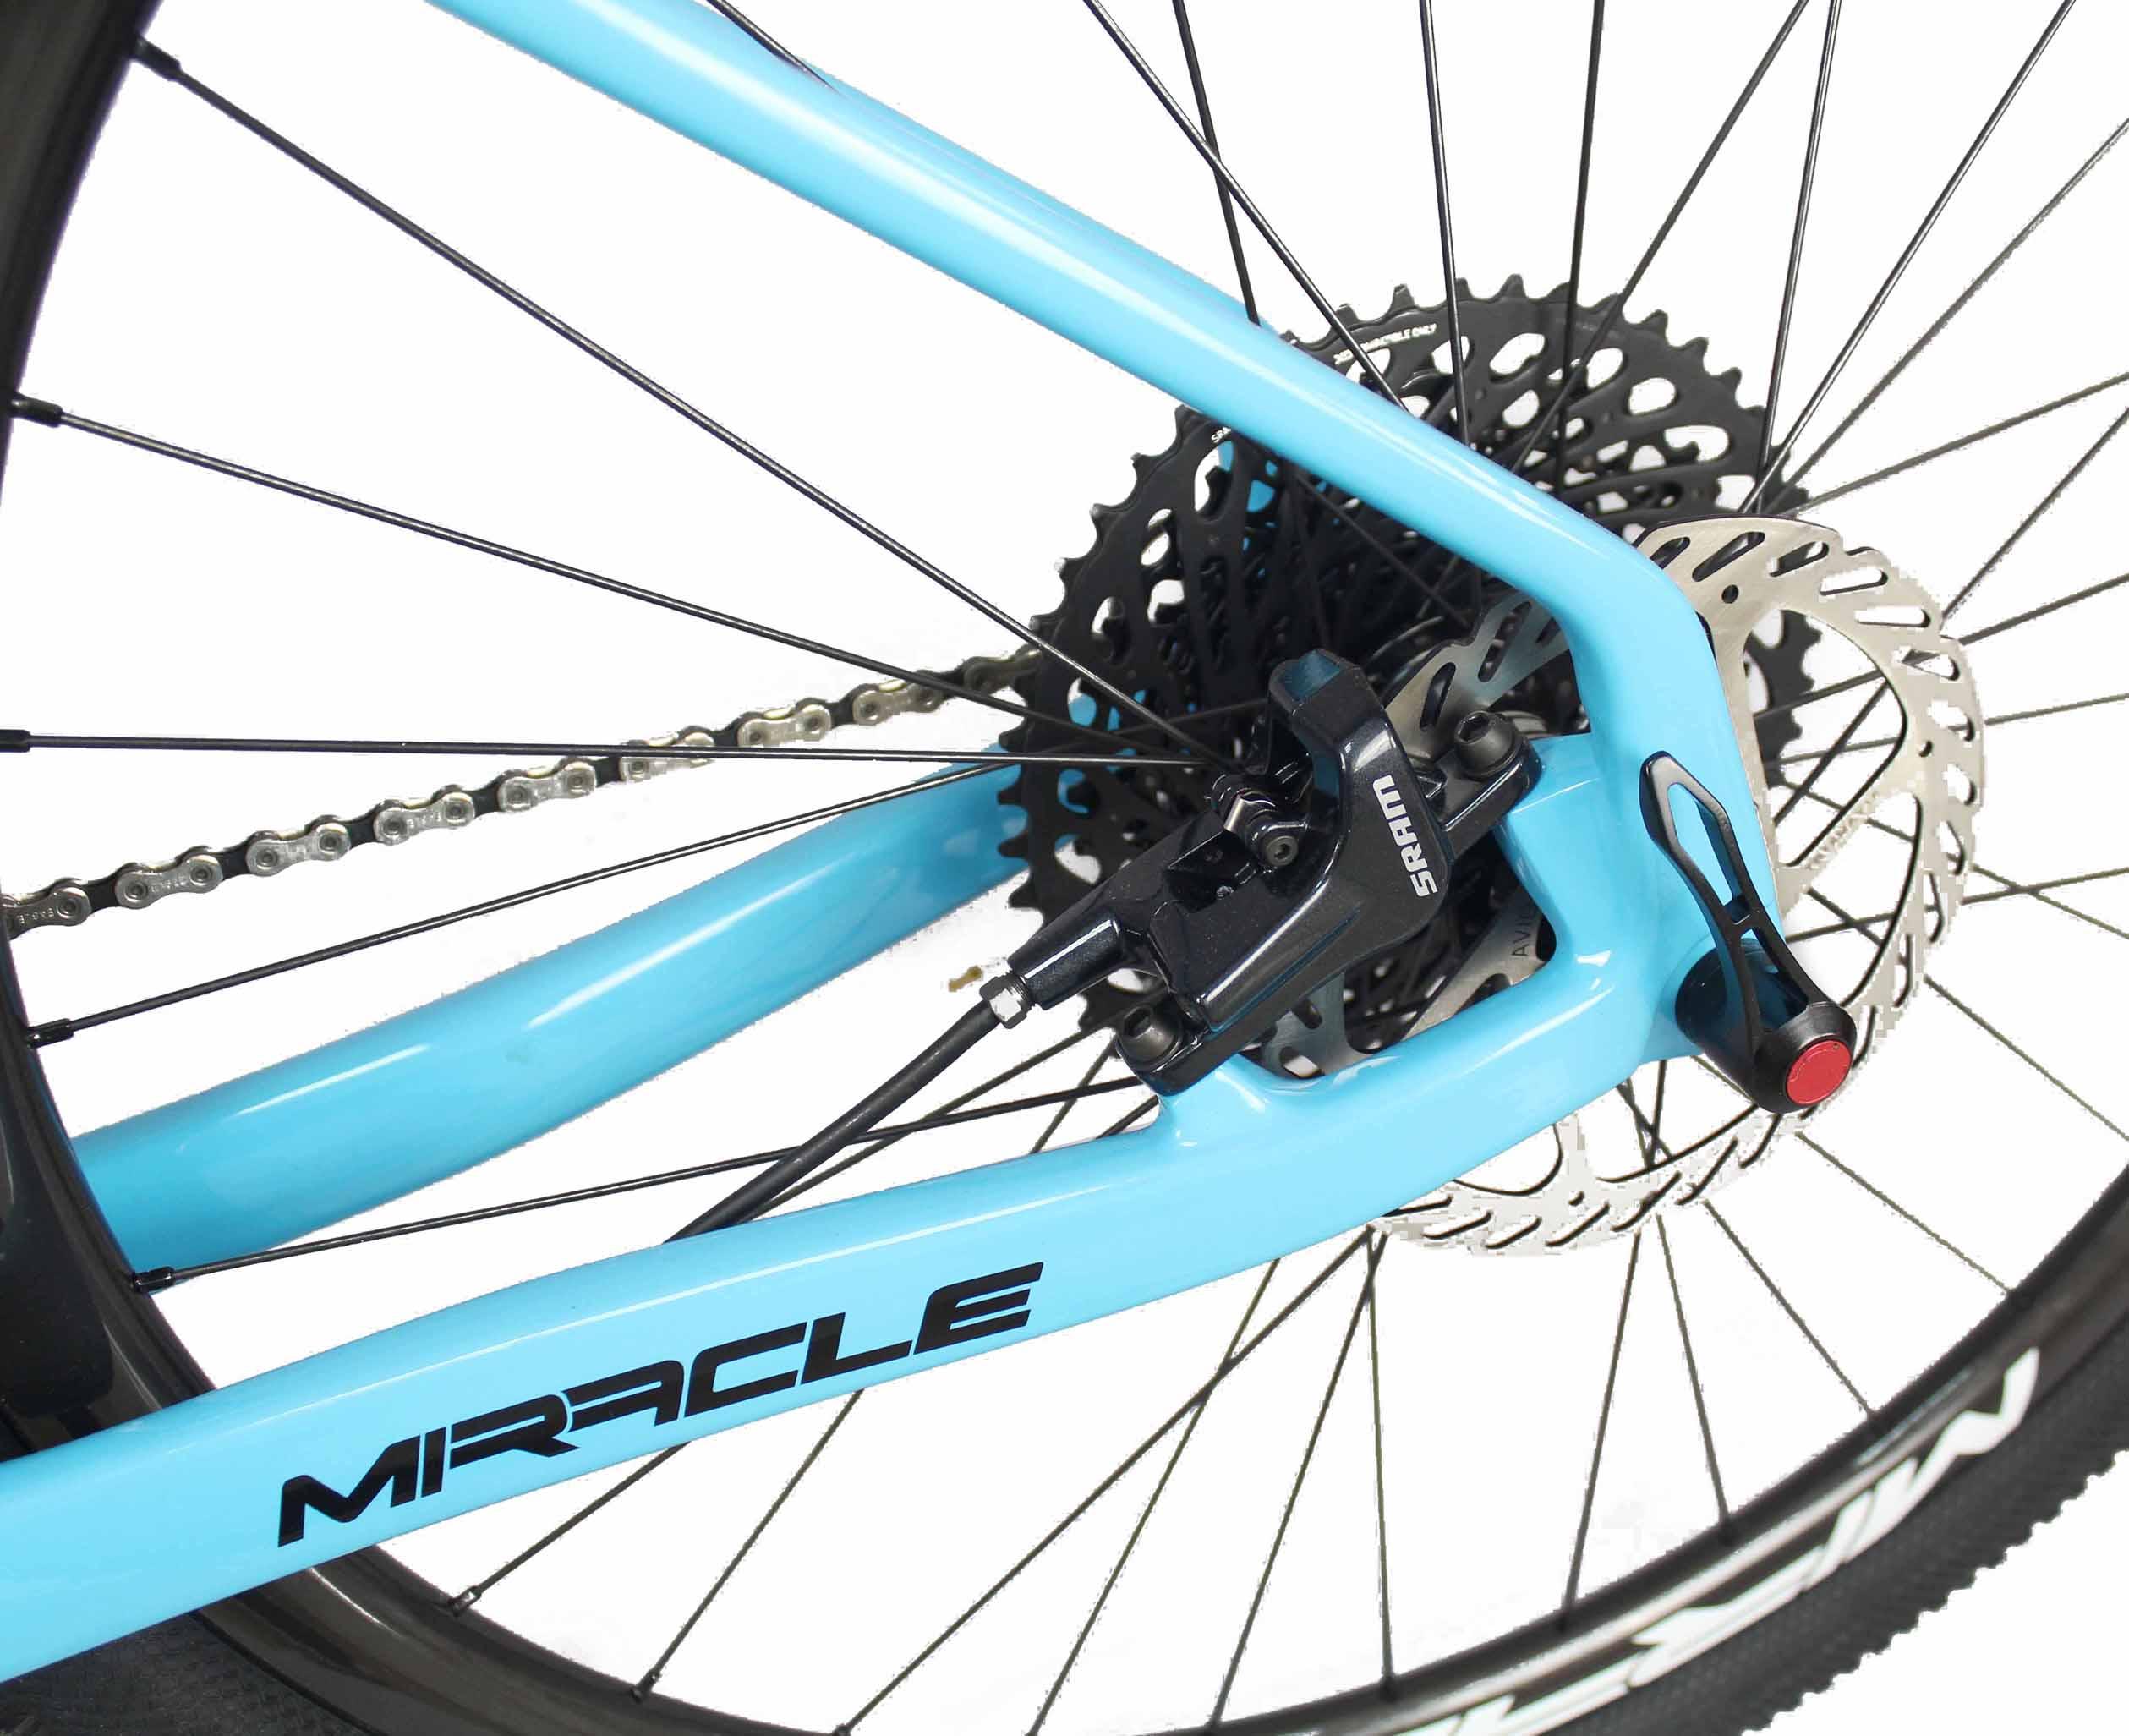 FM199 BOOSTs carbono ligero bicicleta MTB completa carbono mtb hardtail mountain cuadro de bicicleta de carbono 29er